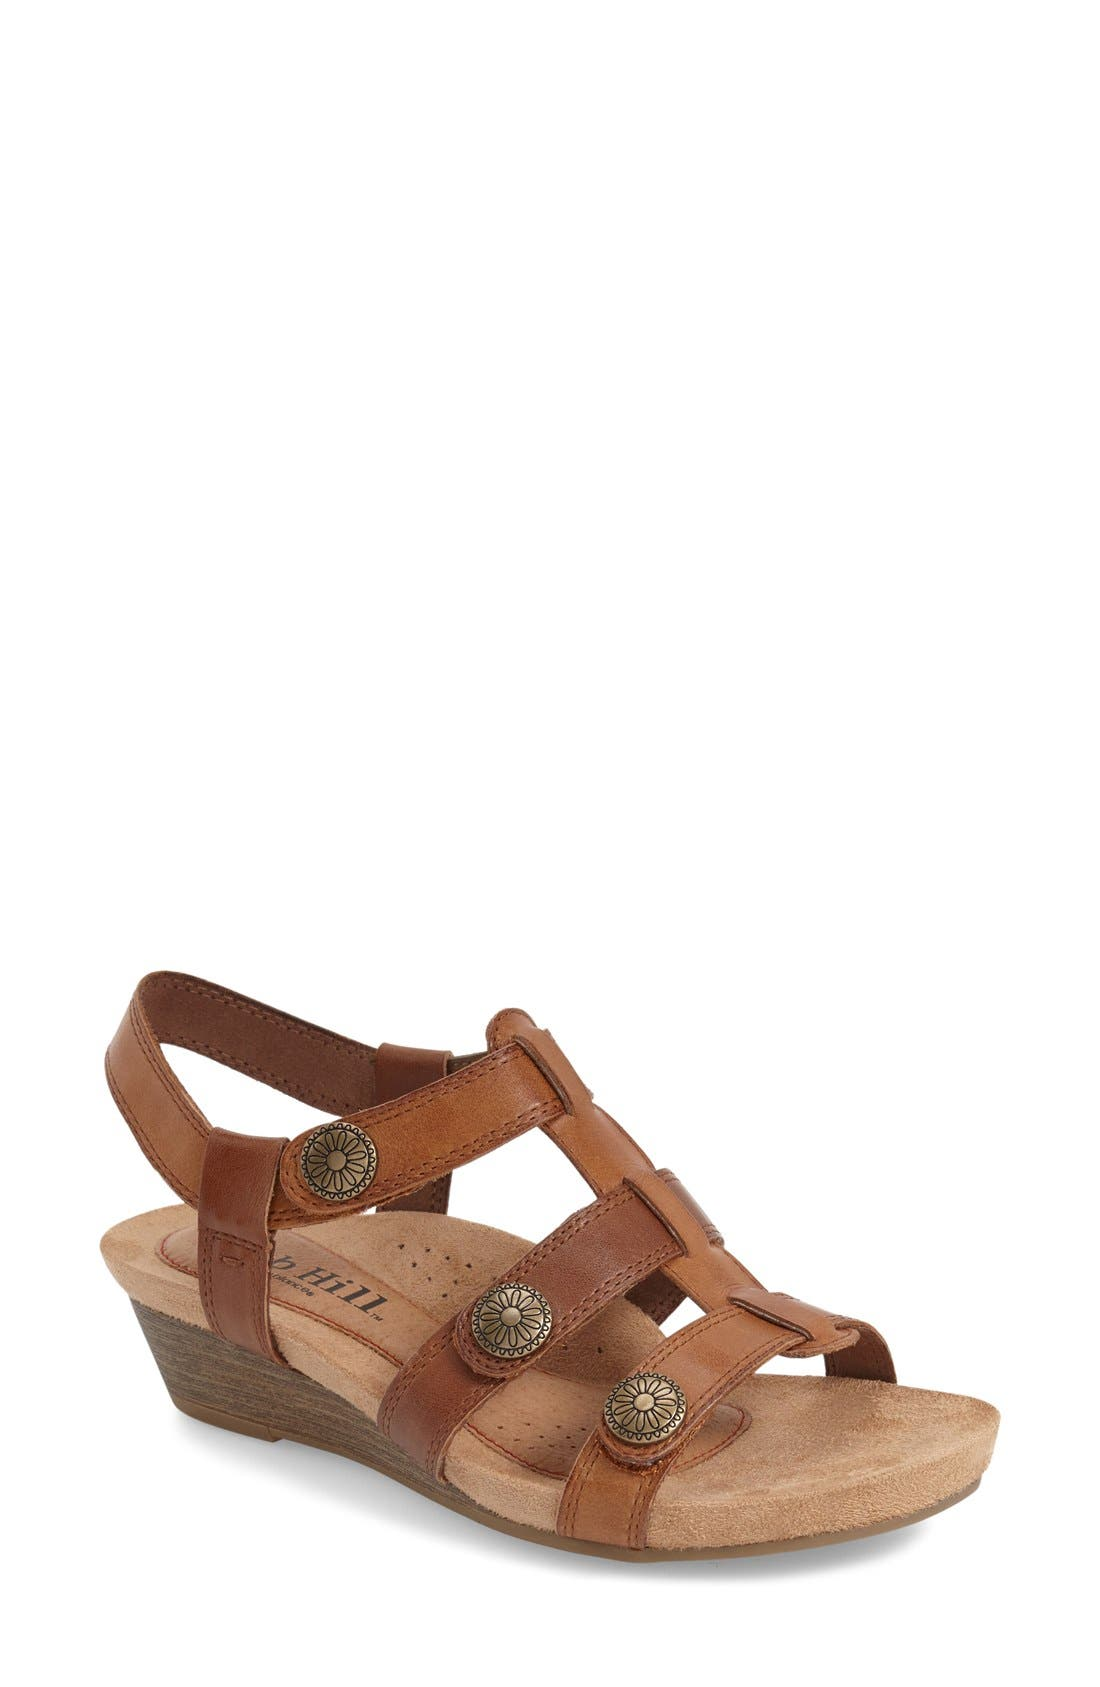 'Harper' Wedge Sandal,                         Main,                         color, TAN LEATHER